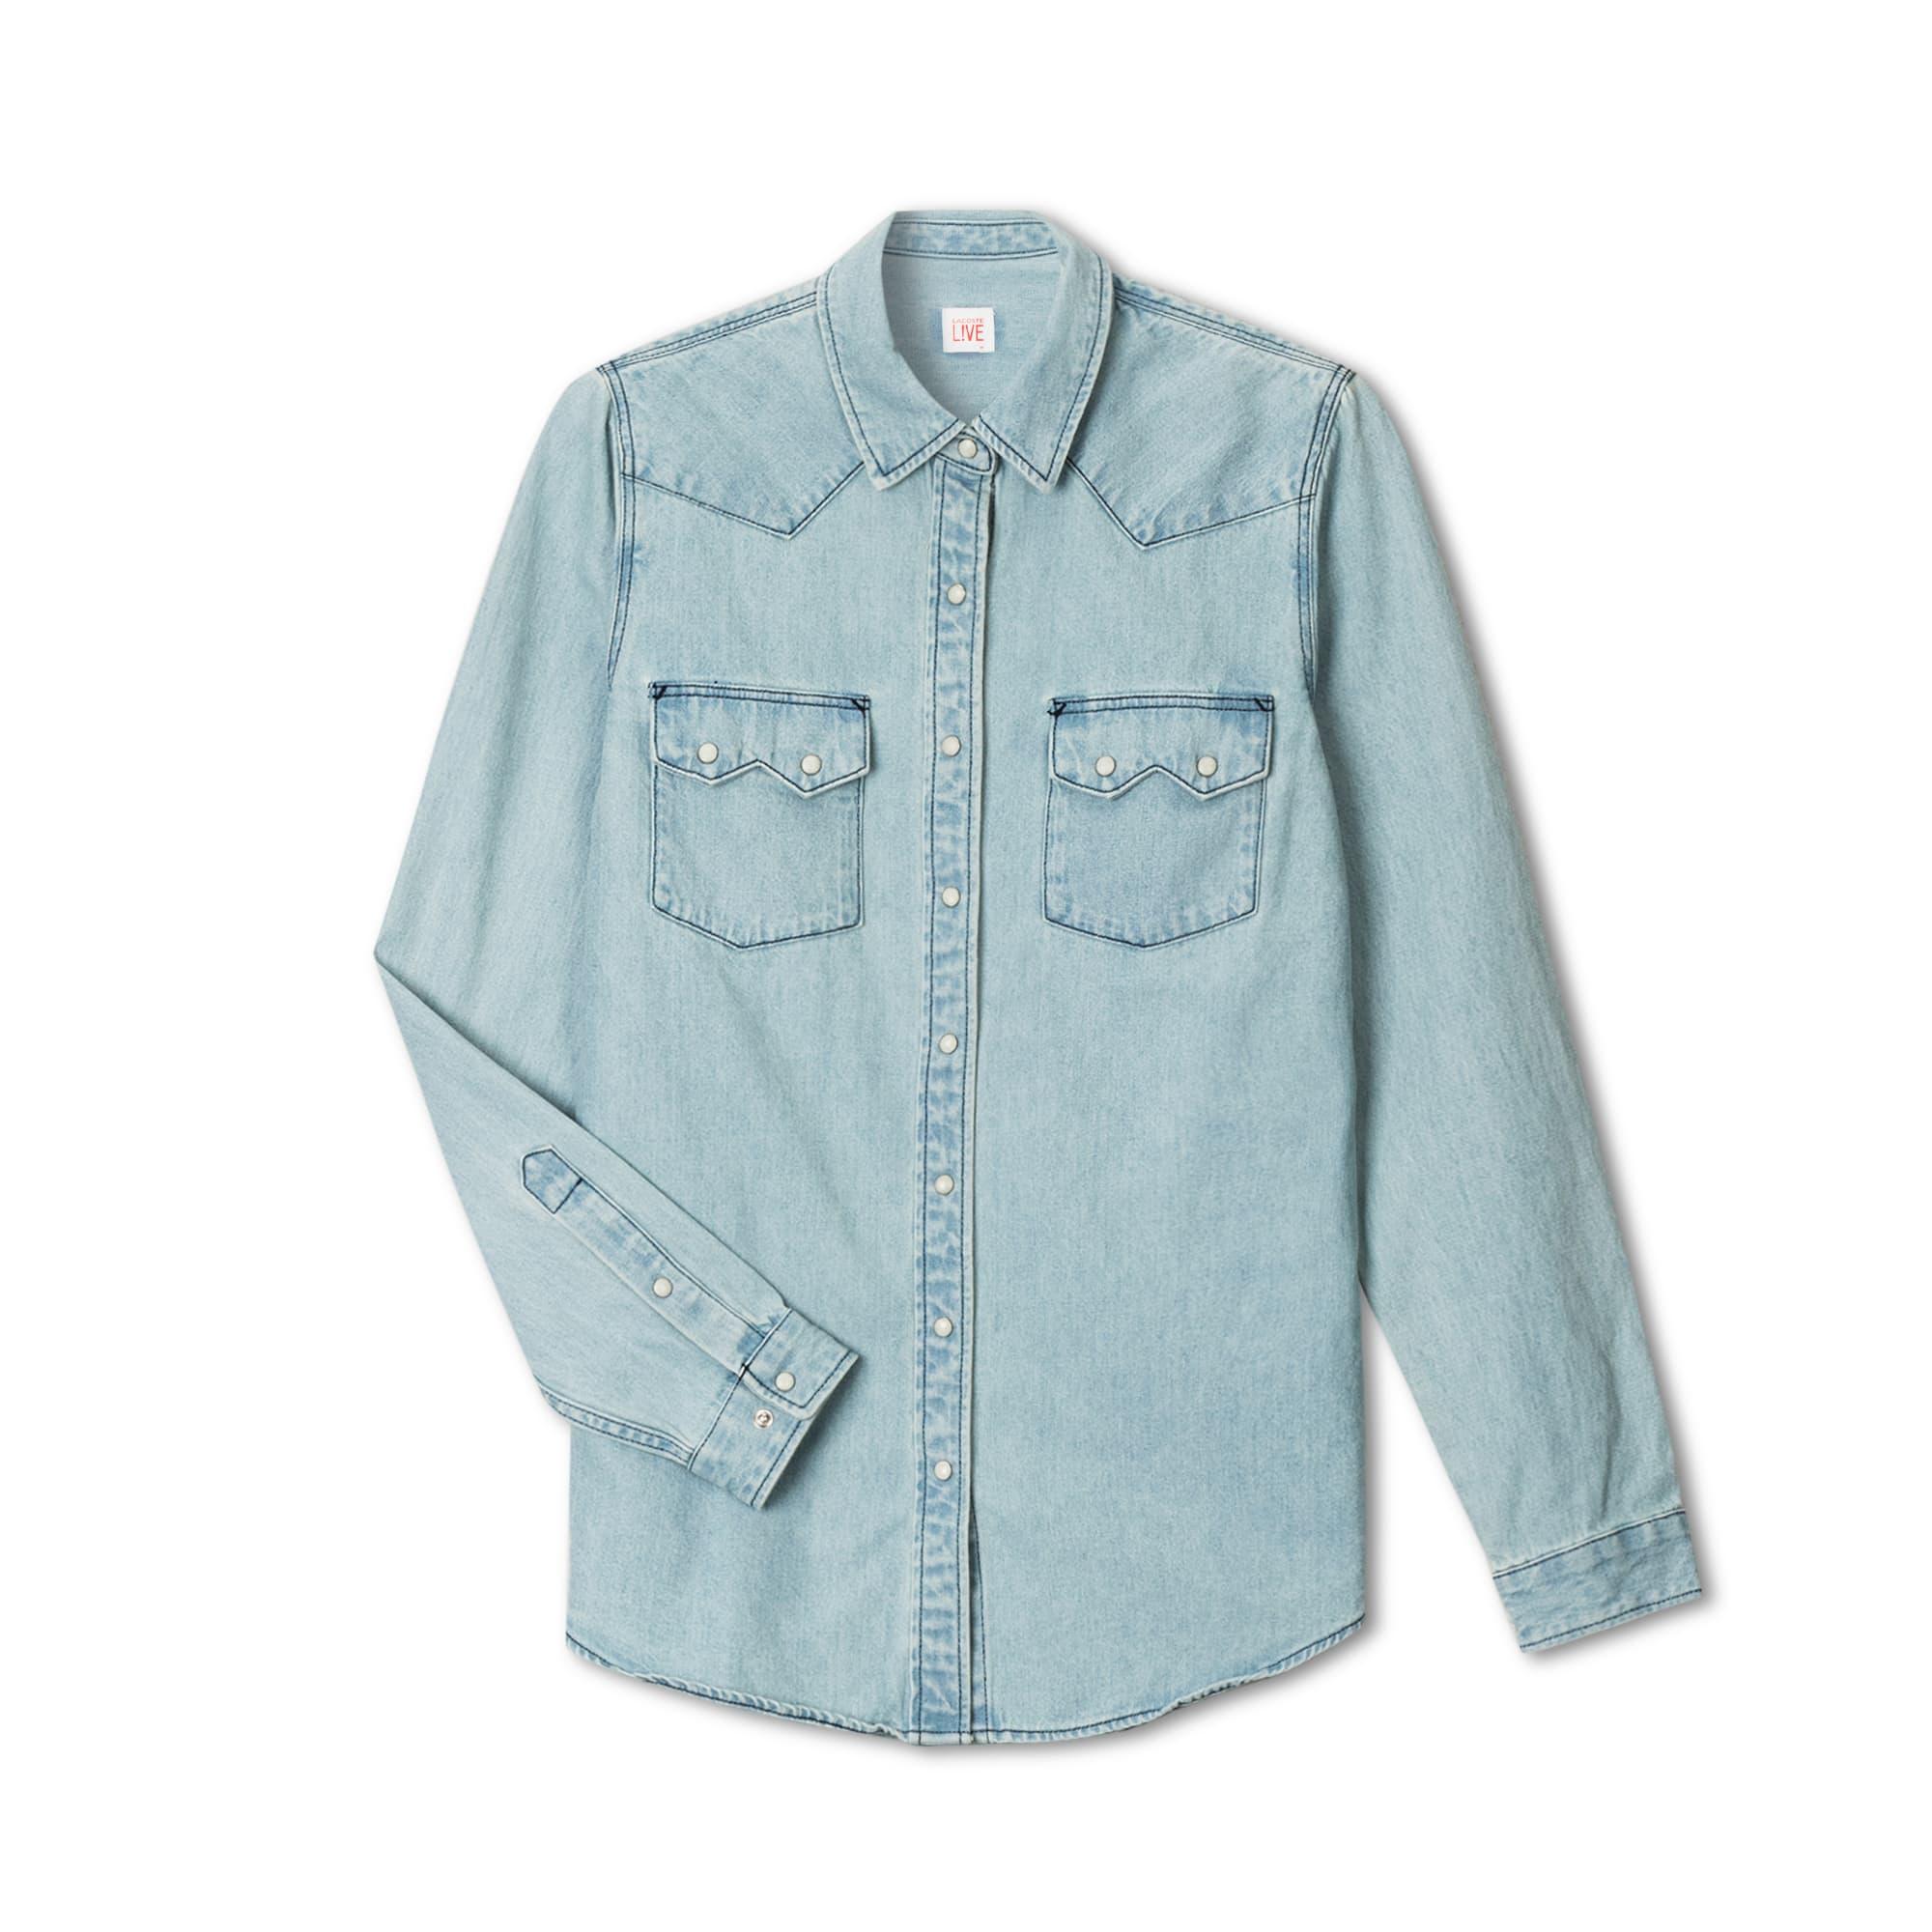 Lacoste LIVE系列女士修身版西式口袋牛仔衬衫